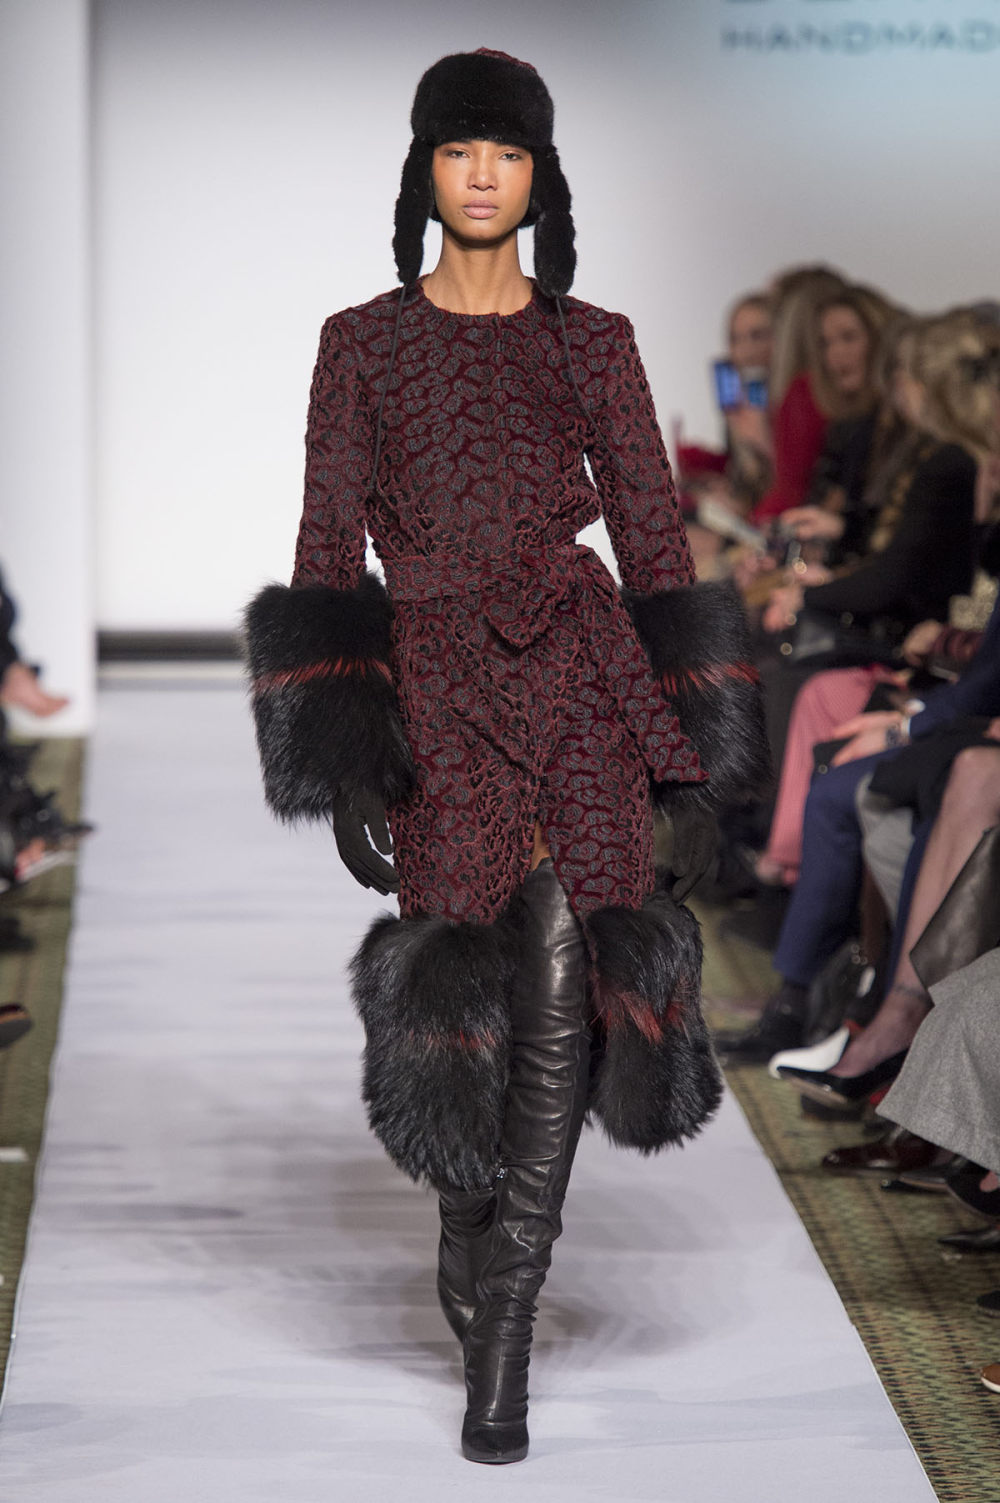 Carolina Herrera时装系列用鲜艳的颜色充满智能的黑白色调-18.jpg